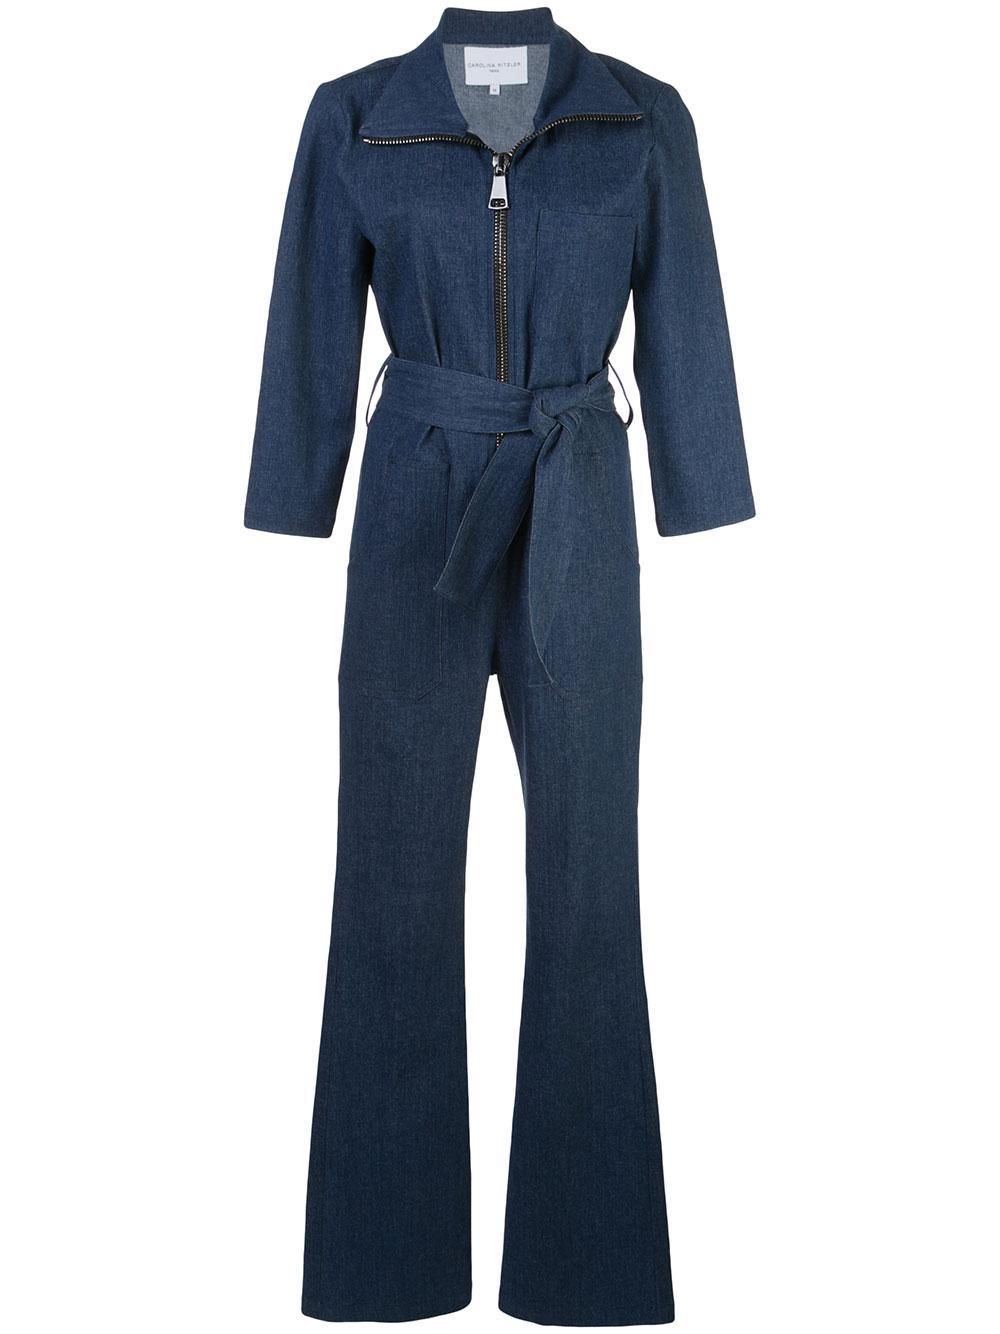 Emma Peel Denim Long Sleeve Zip-Up Jumpsuit